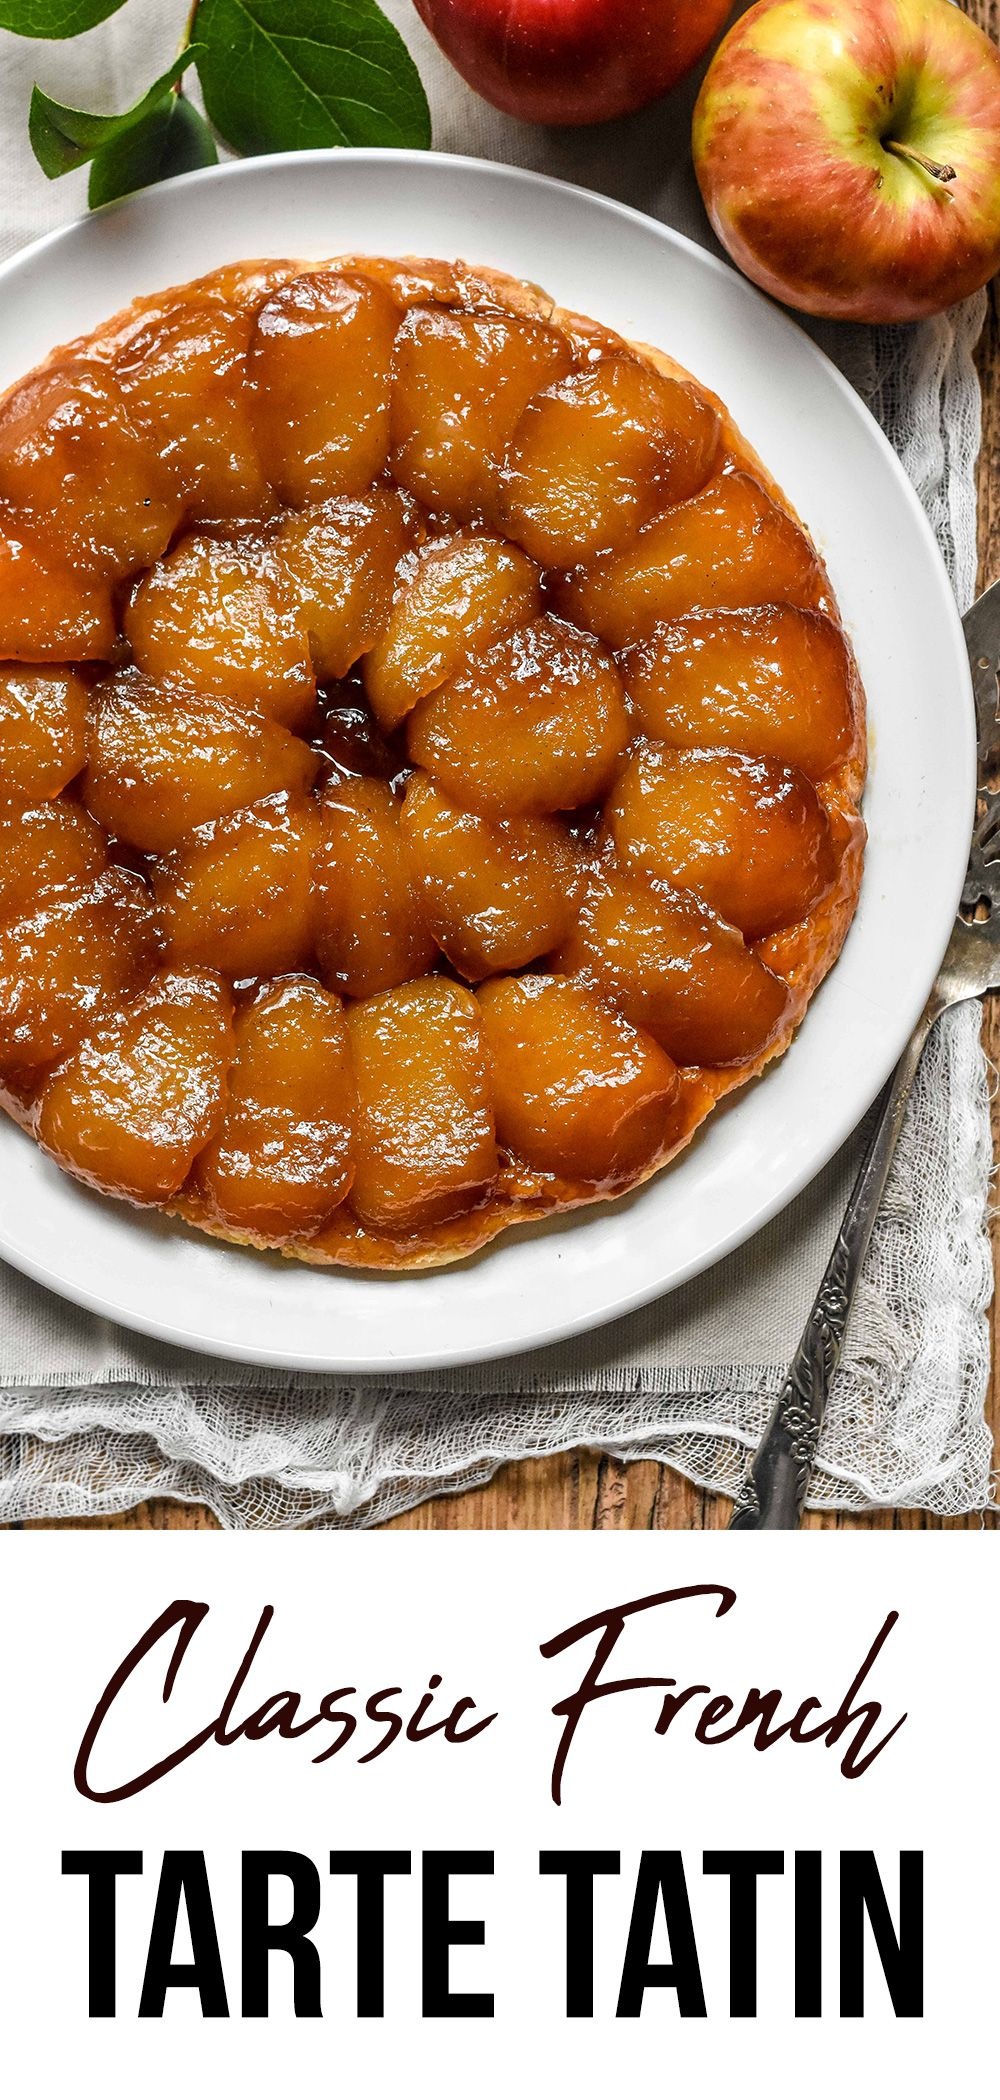 Classic tarte tatin apple tarte tatin french cuisine